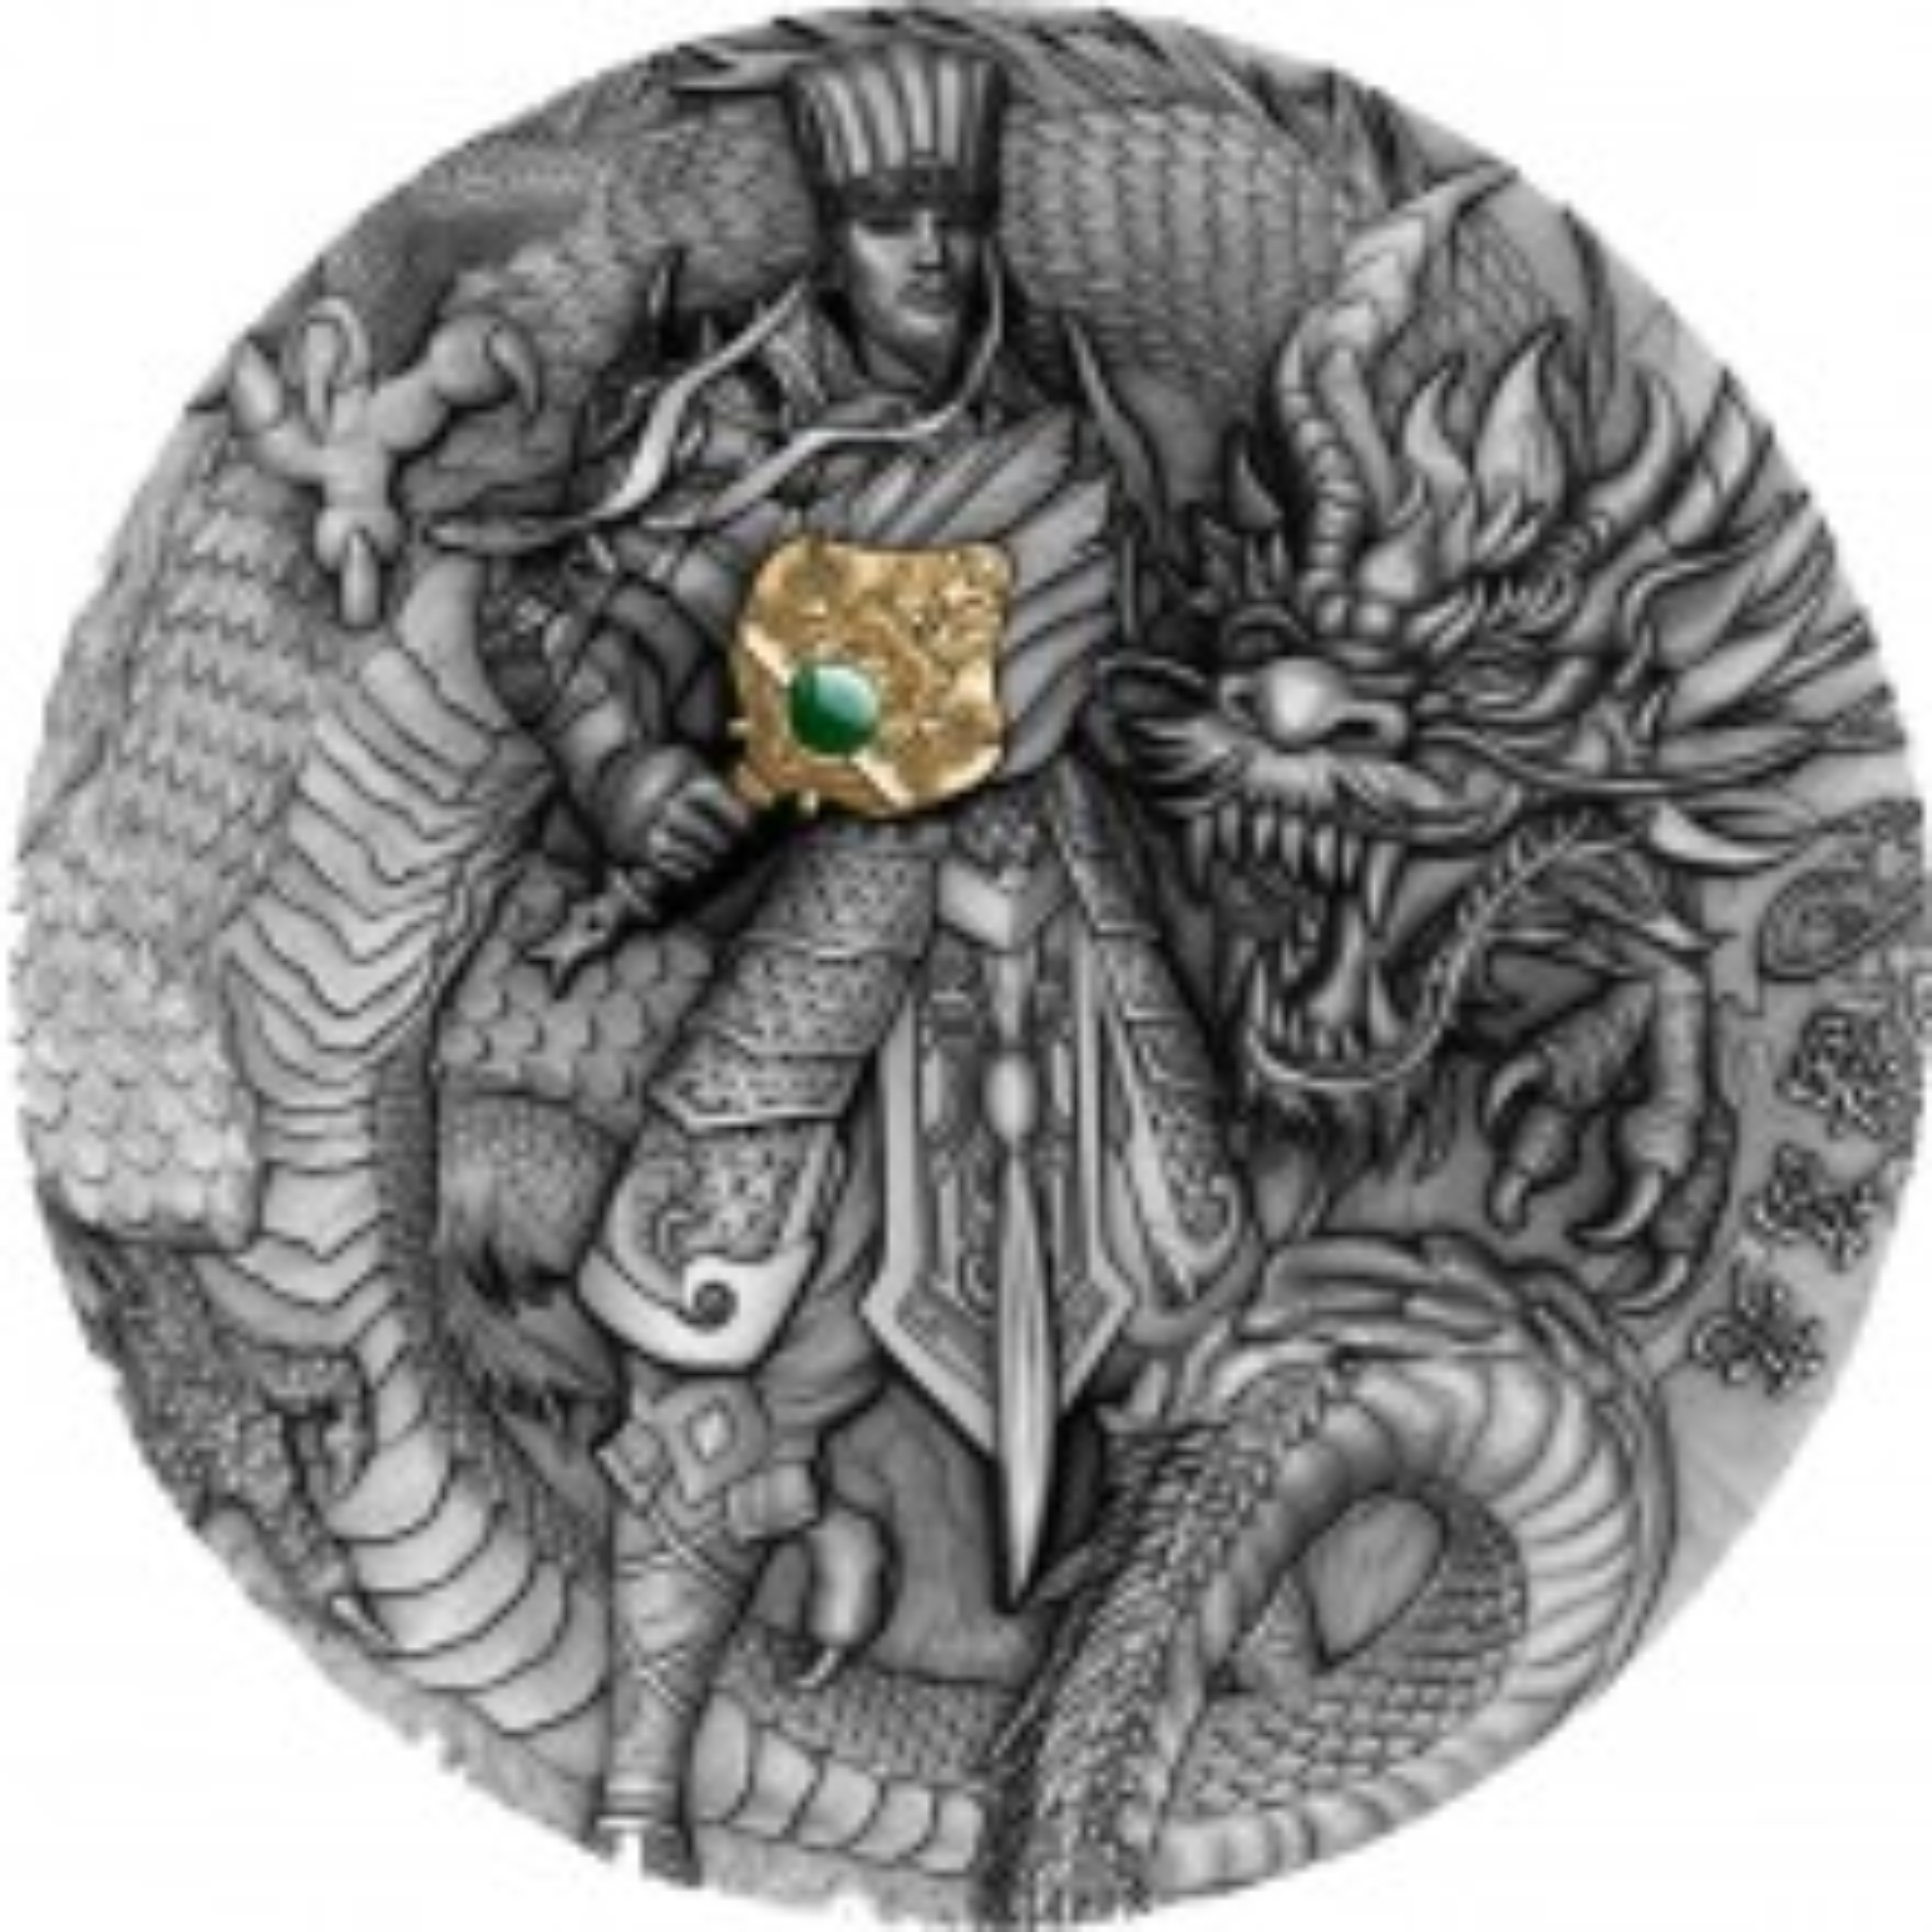 2 troy ounce zilveren munt Zhuge Liang